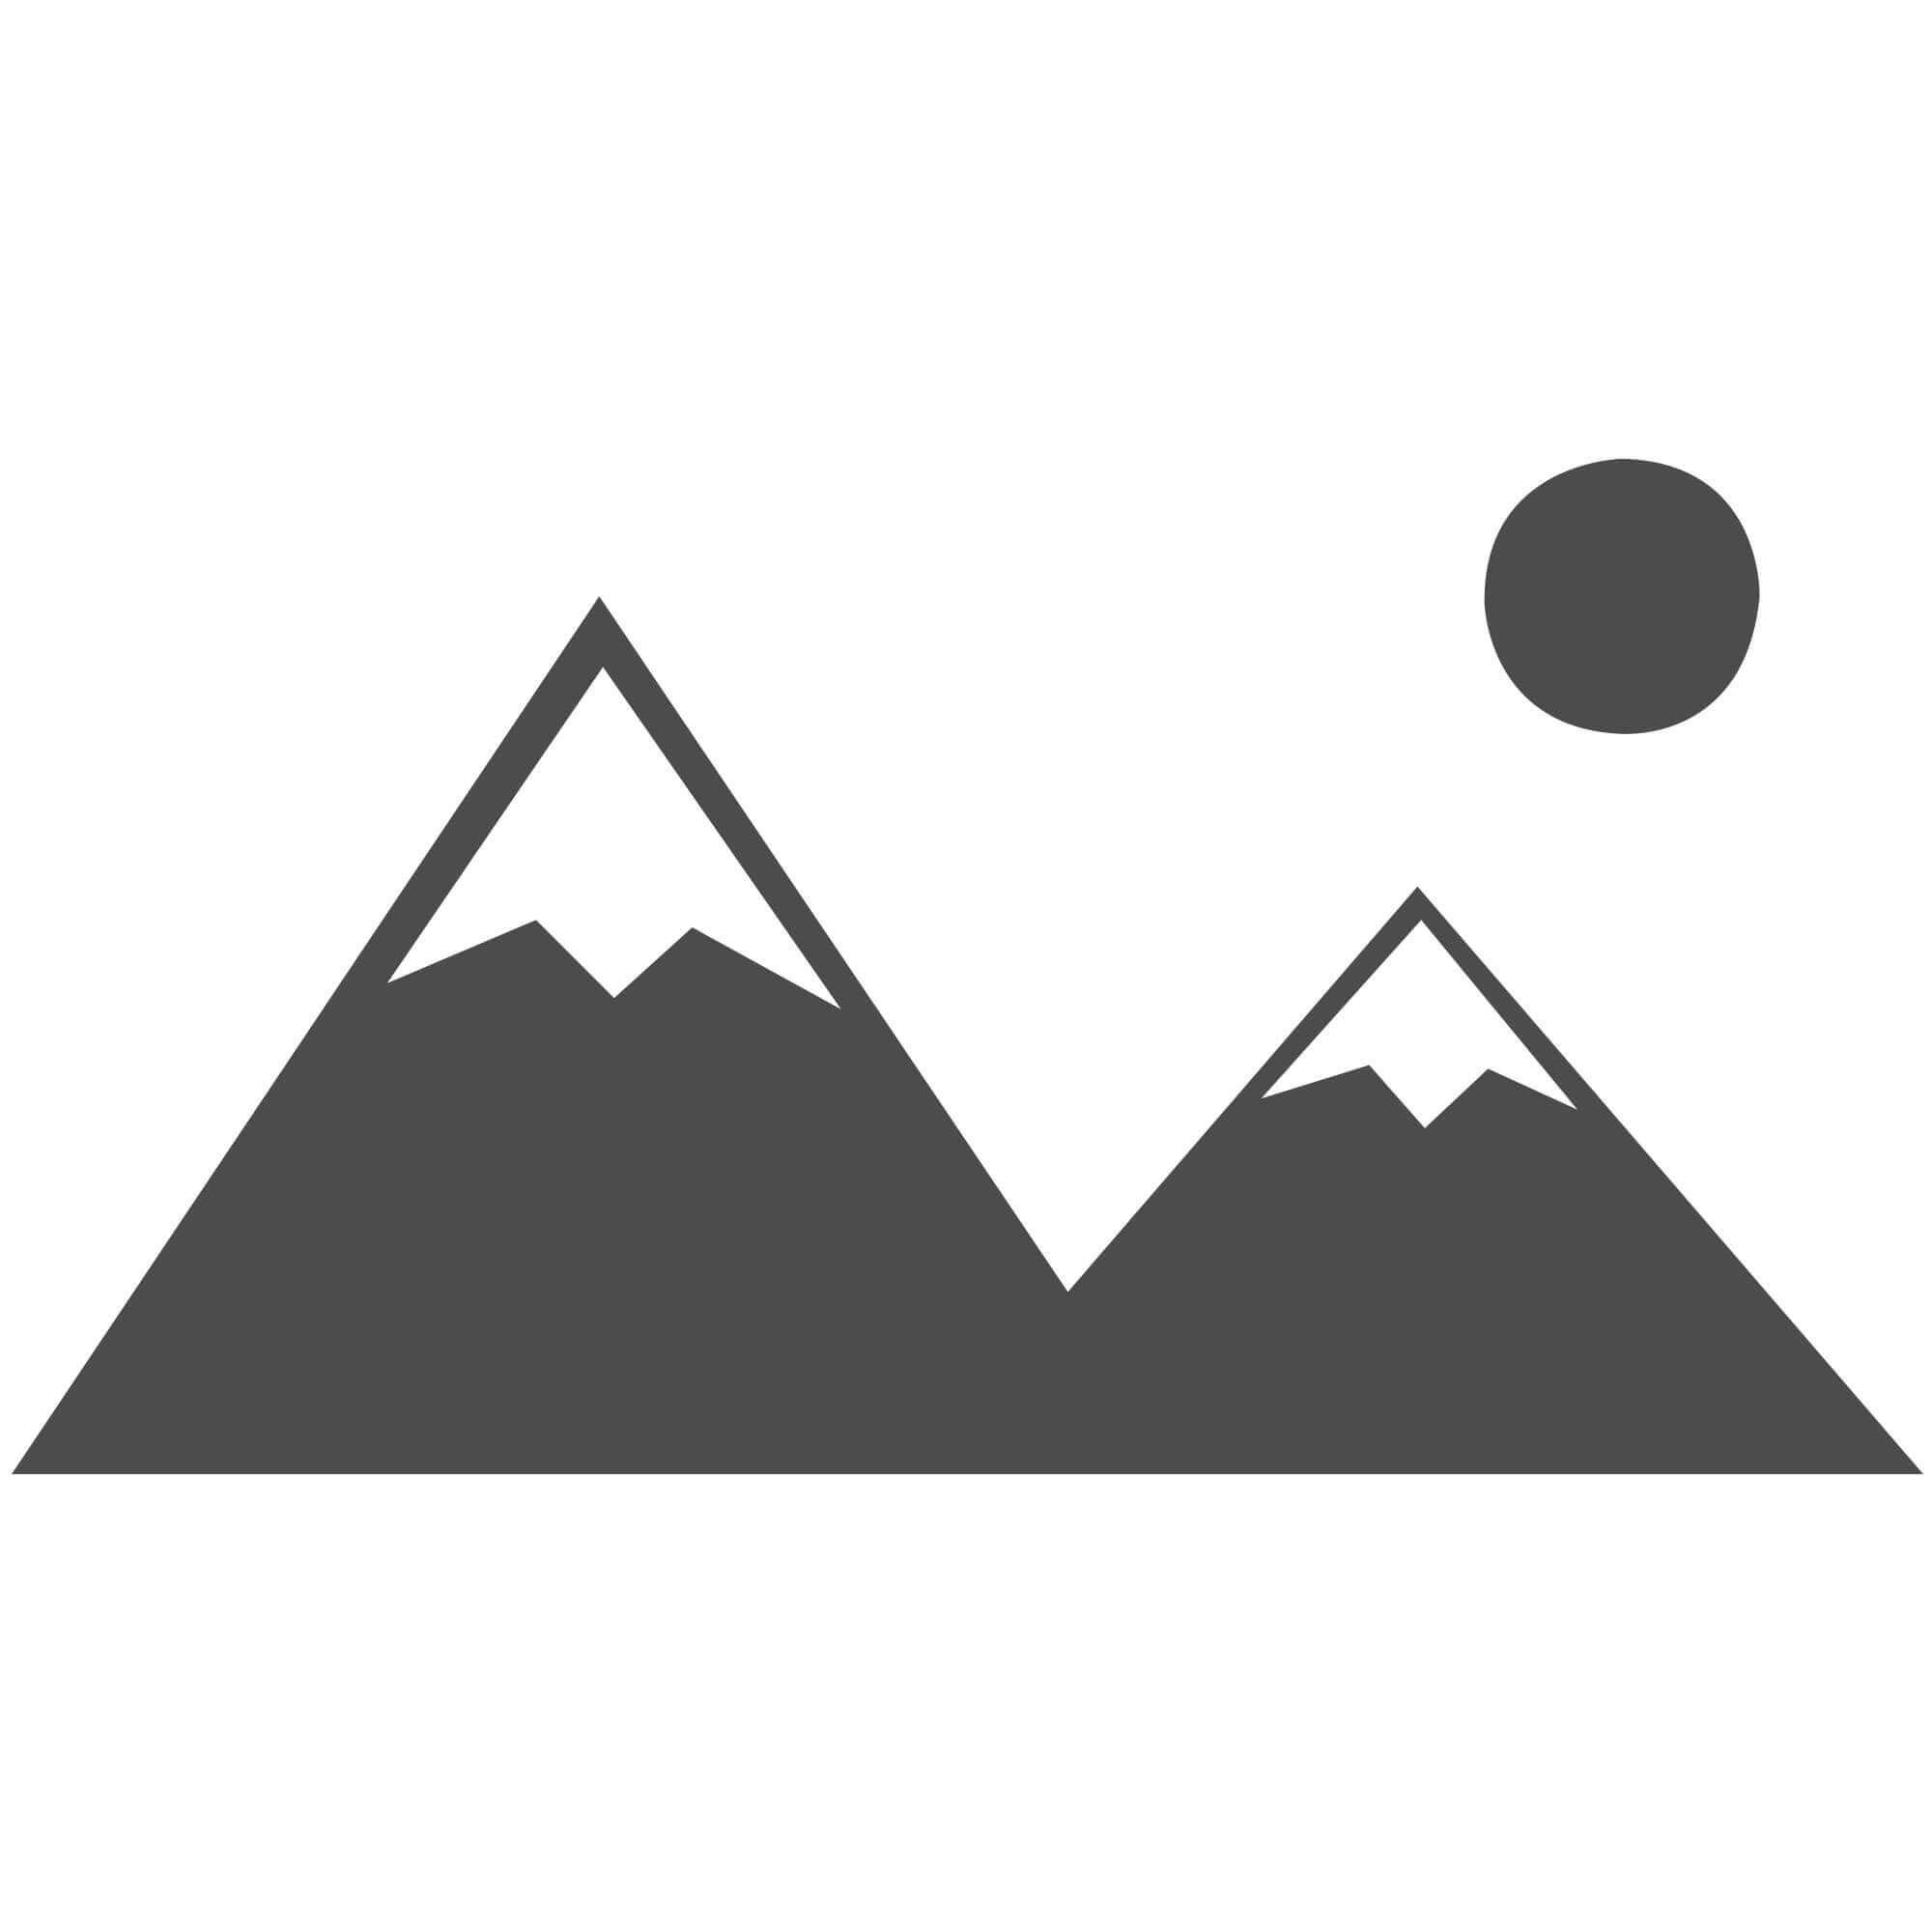 "Athena Shaggy Rug - Charcoal Grey - Size 120 x 170 cm (4' x 5'7"")"